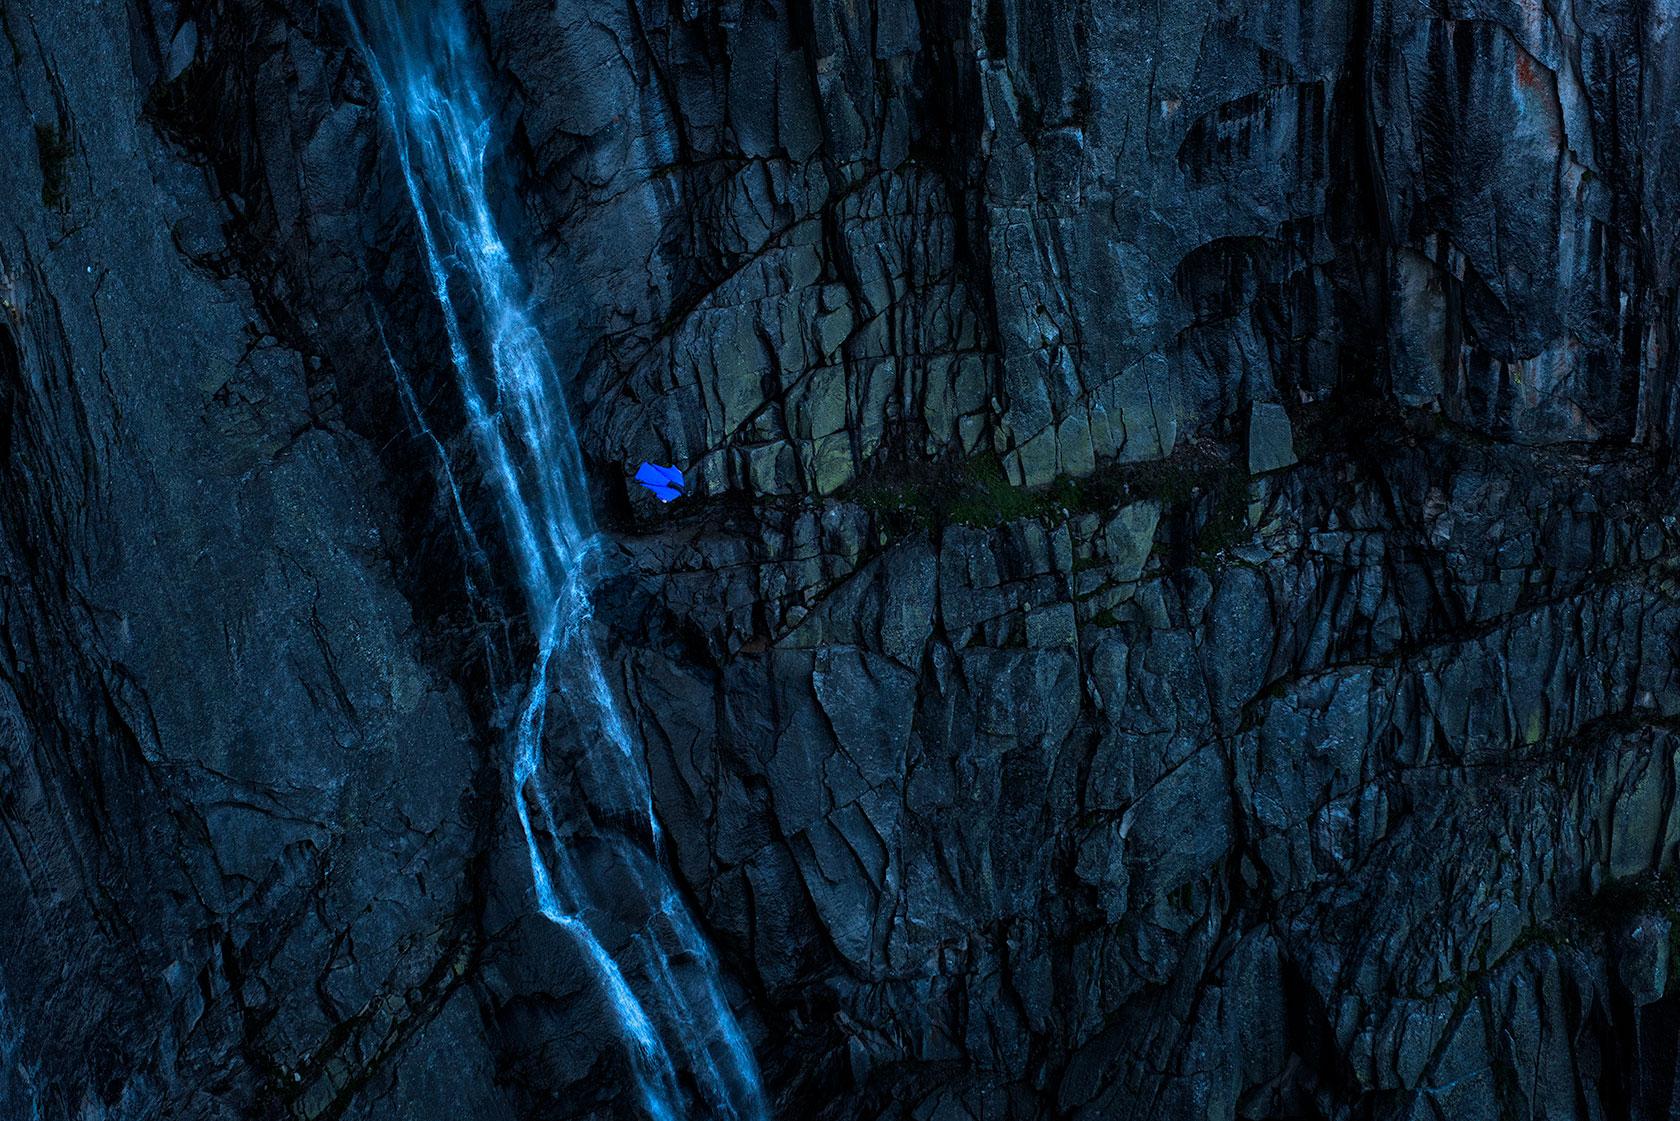 austin-trigg-wing-suit-base-jump-fly-yosemite-lifestyle-california-adventure-thrill-seeking-waterfall-rock-background-cliff-flying.jpg